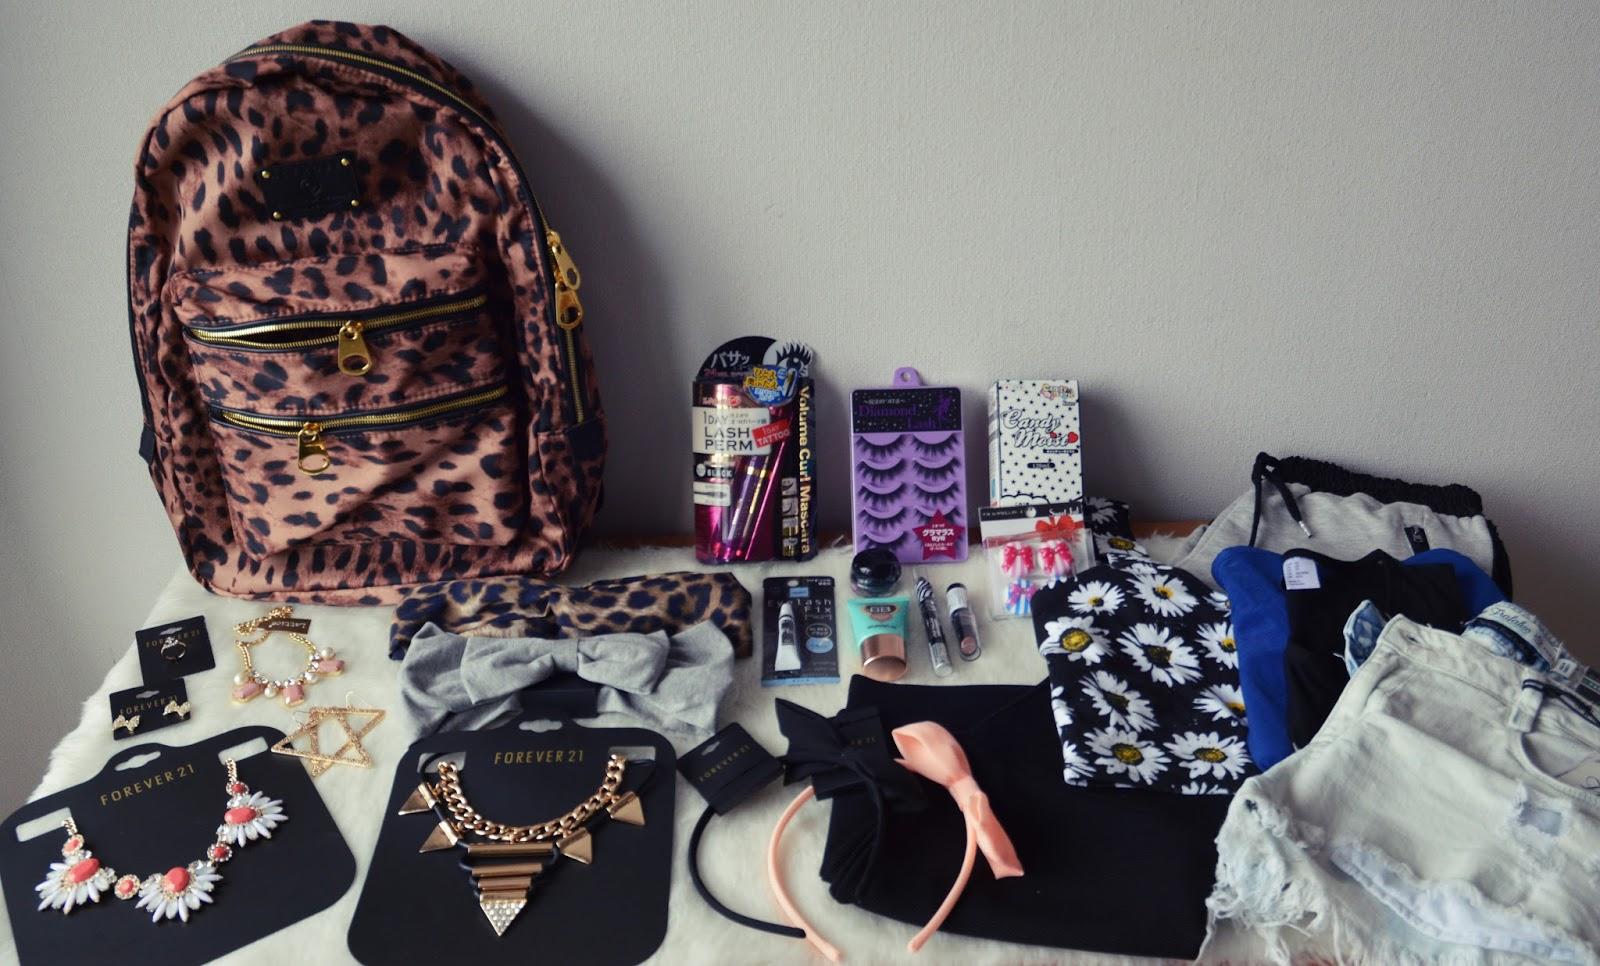 http://leopardcouture.blogspot.com/2014/02/tokyo-shopping-haul.html